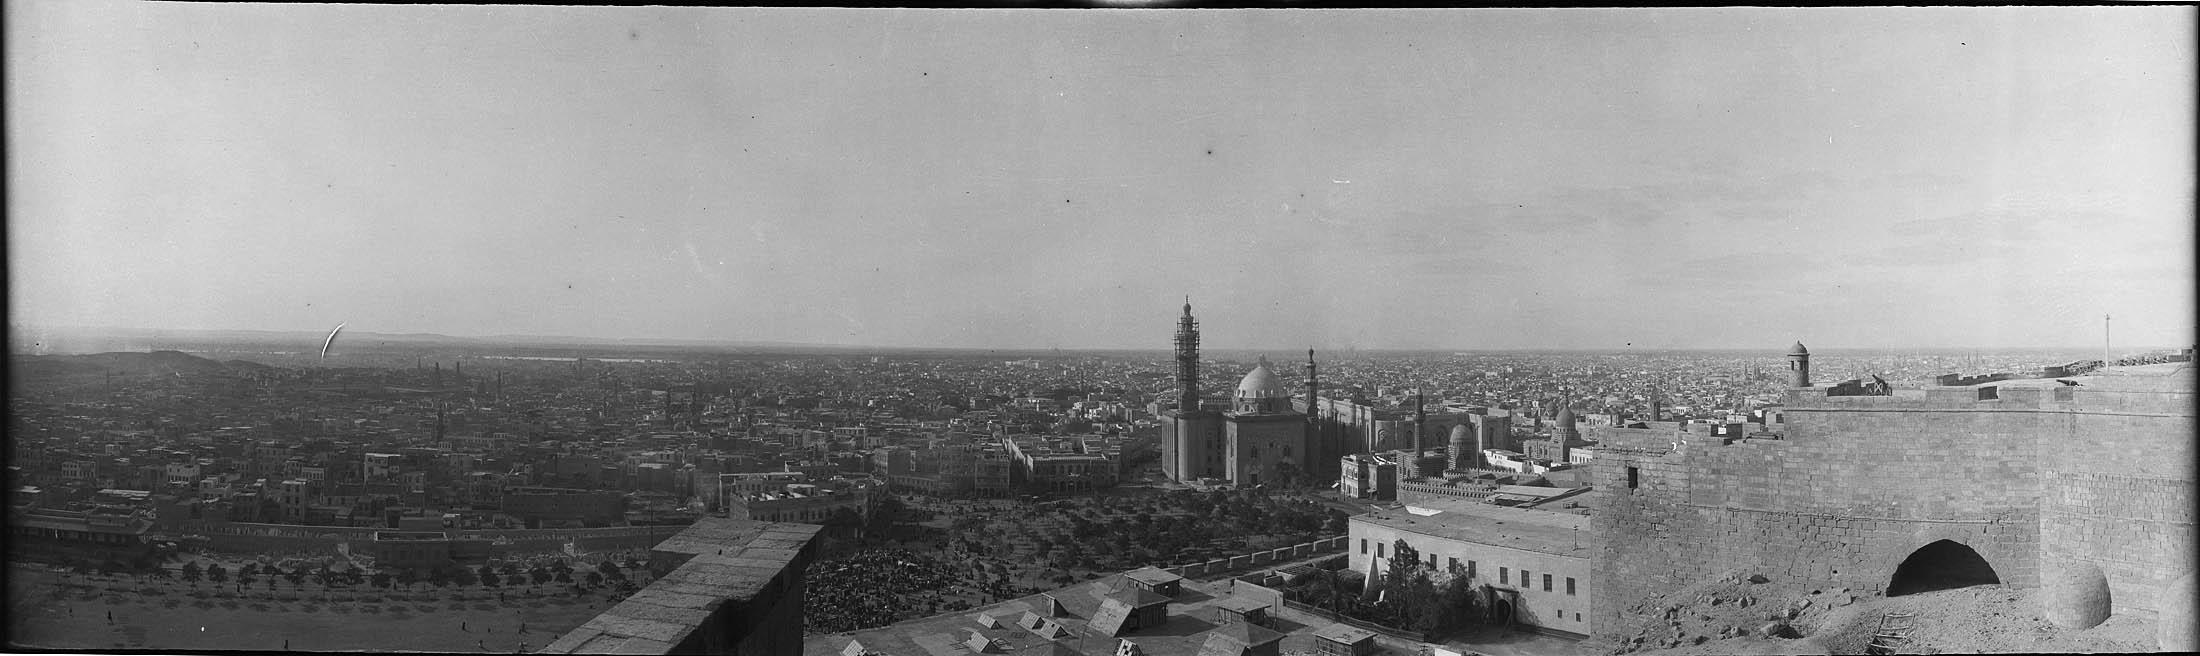 Cairo, Egypt, 1900s